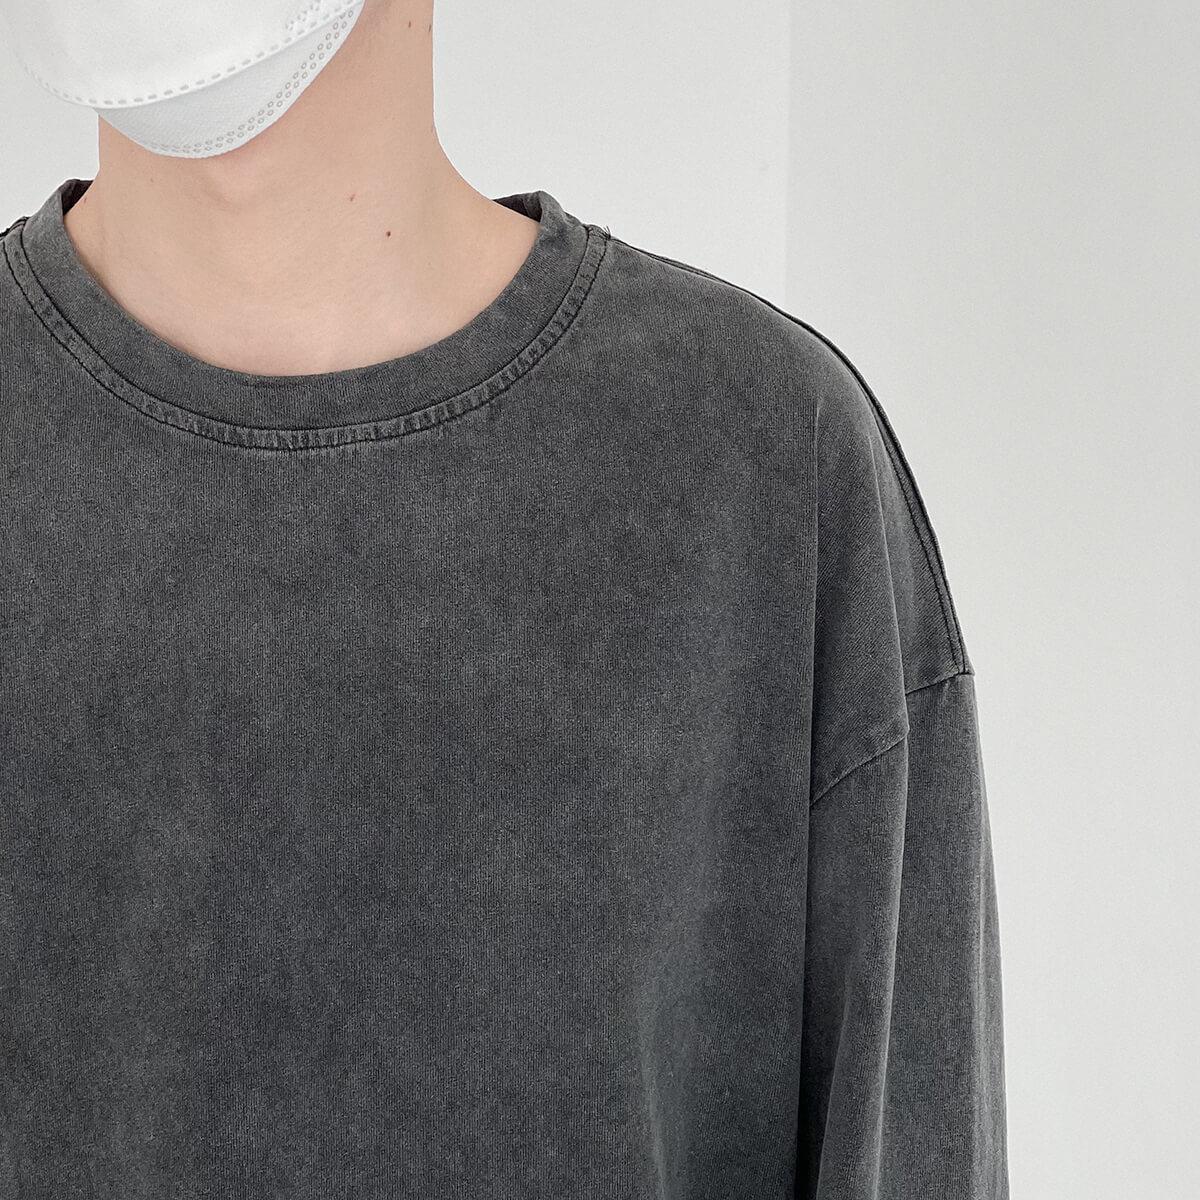 Лонгслив DAZO Studio Sweatshirt Grunge Shade (7)